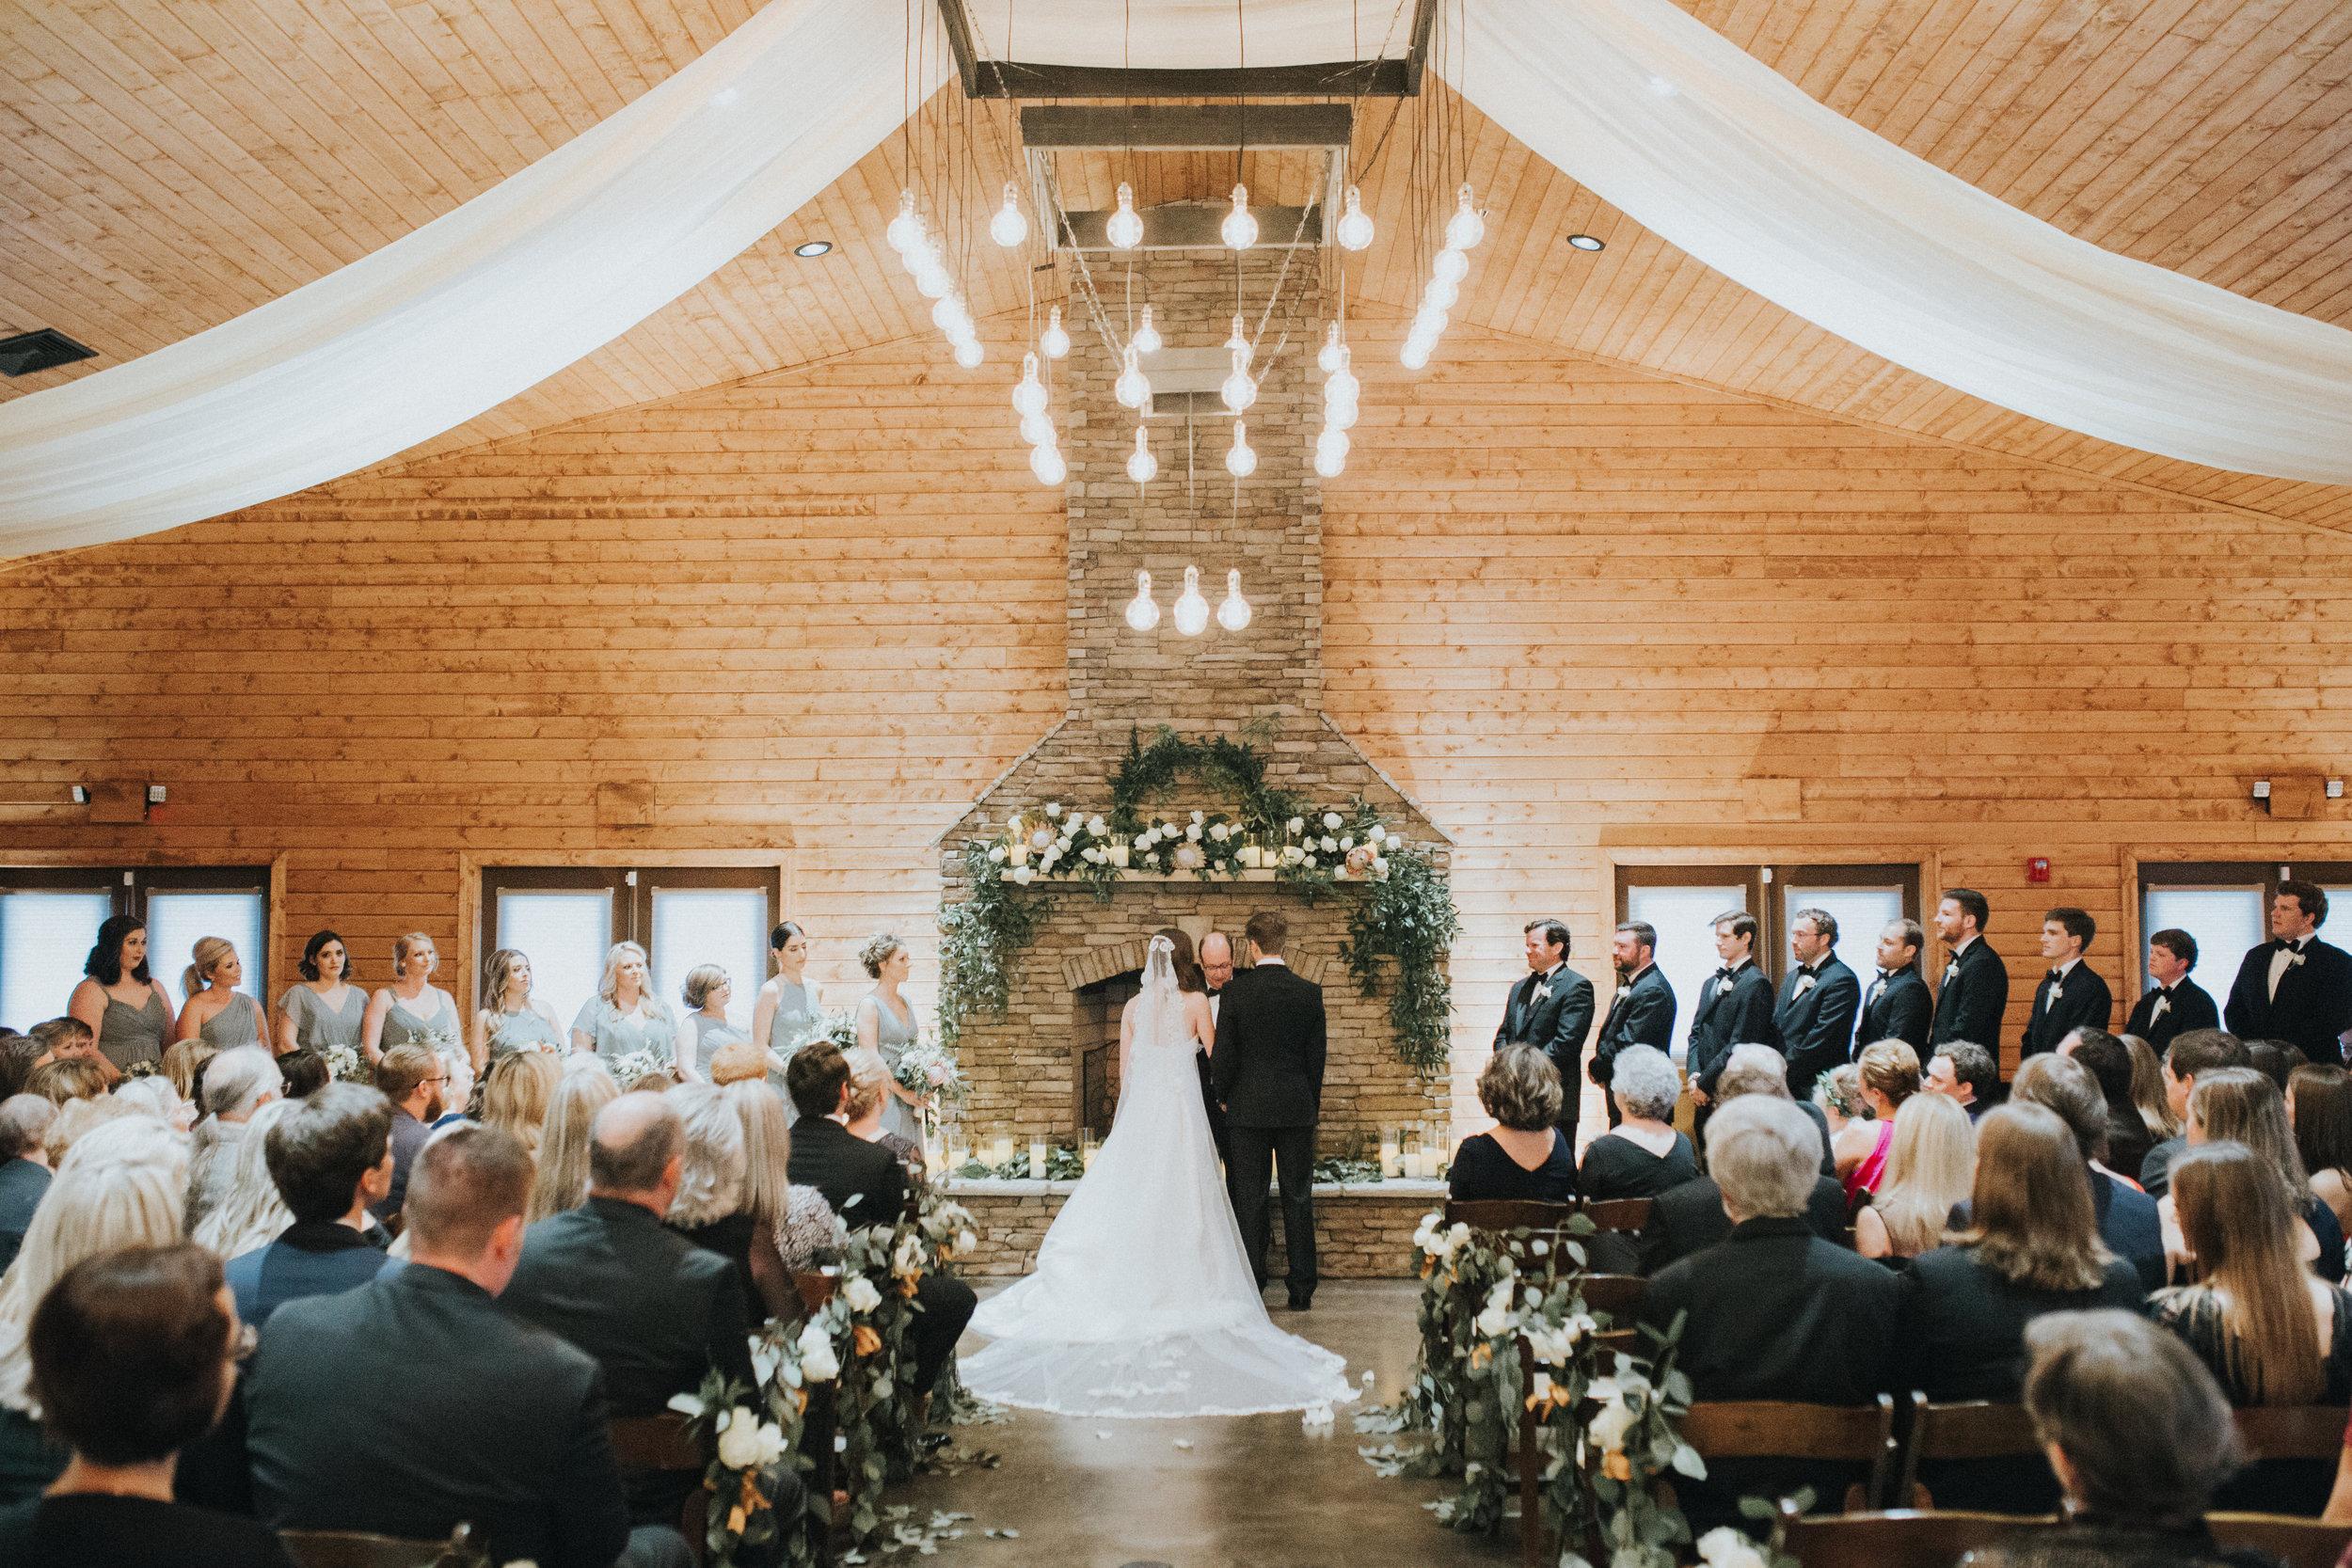 WeddingtonWedding0621.jpg